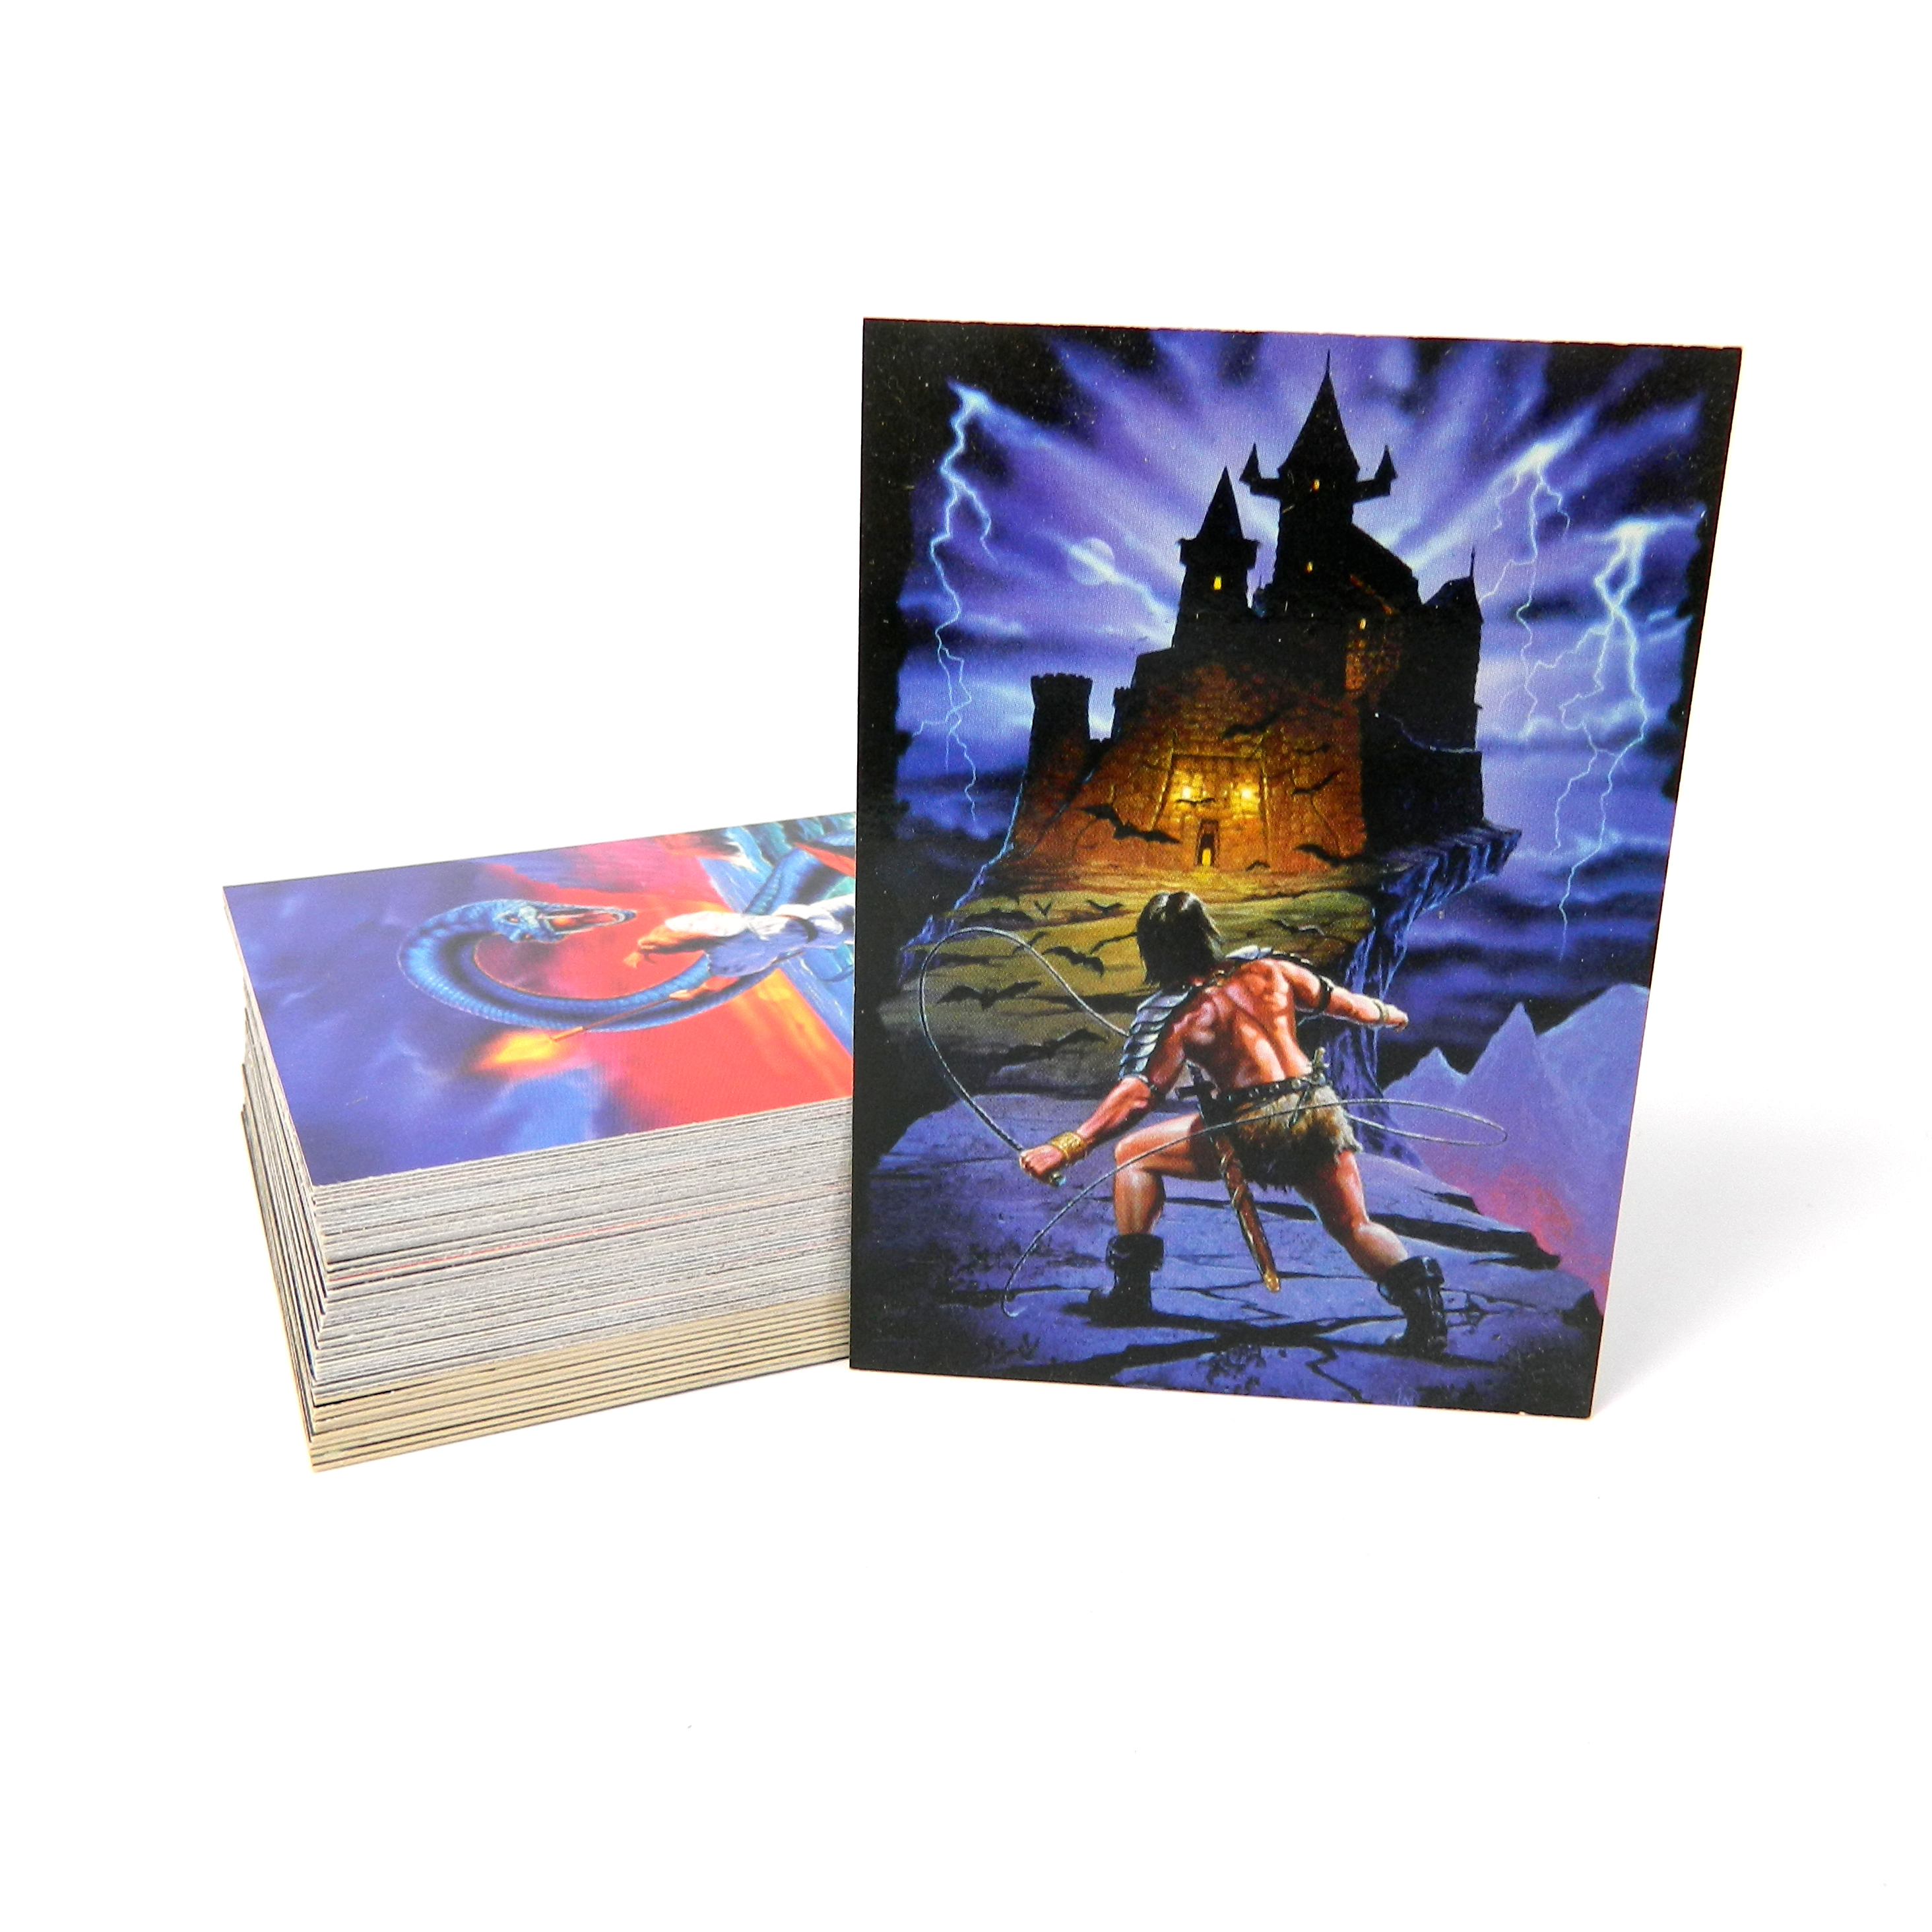 Complete Card Set w/ TEKCHROME SET Cardz/1994 THE FANTASY ART OF LEE MacLEOD